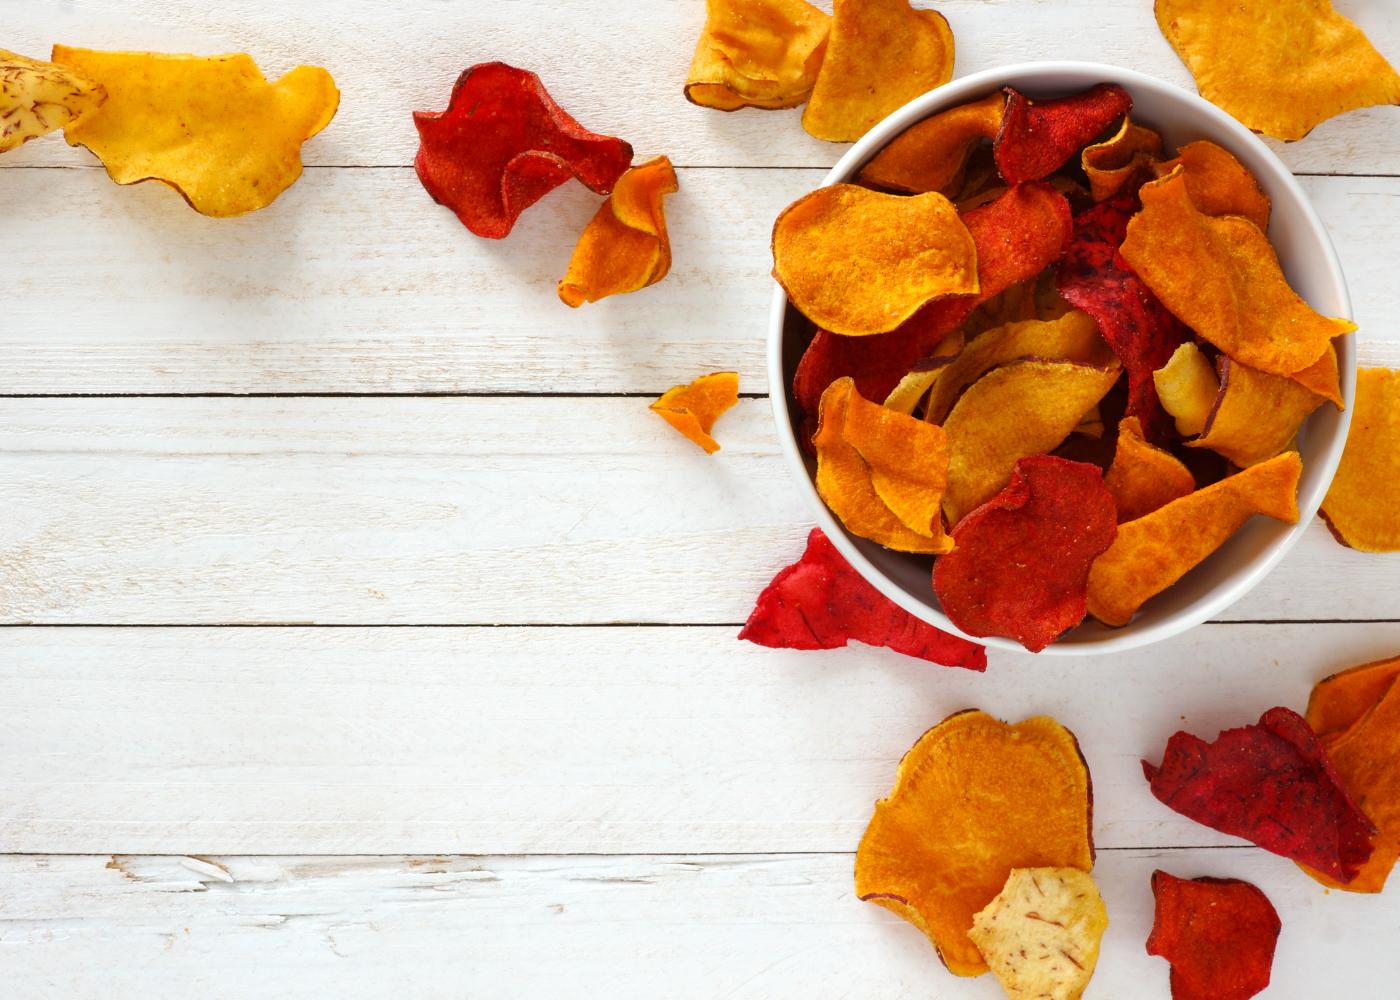 chips de batata-doce e beterraba